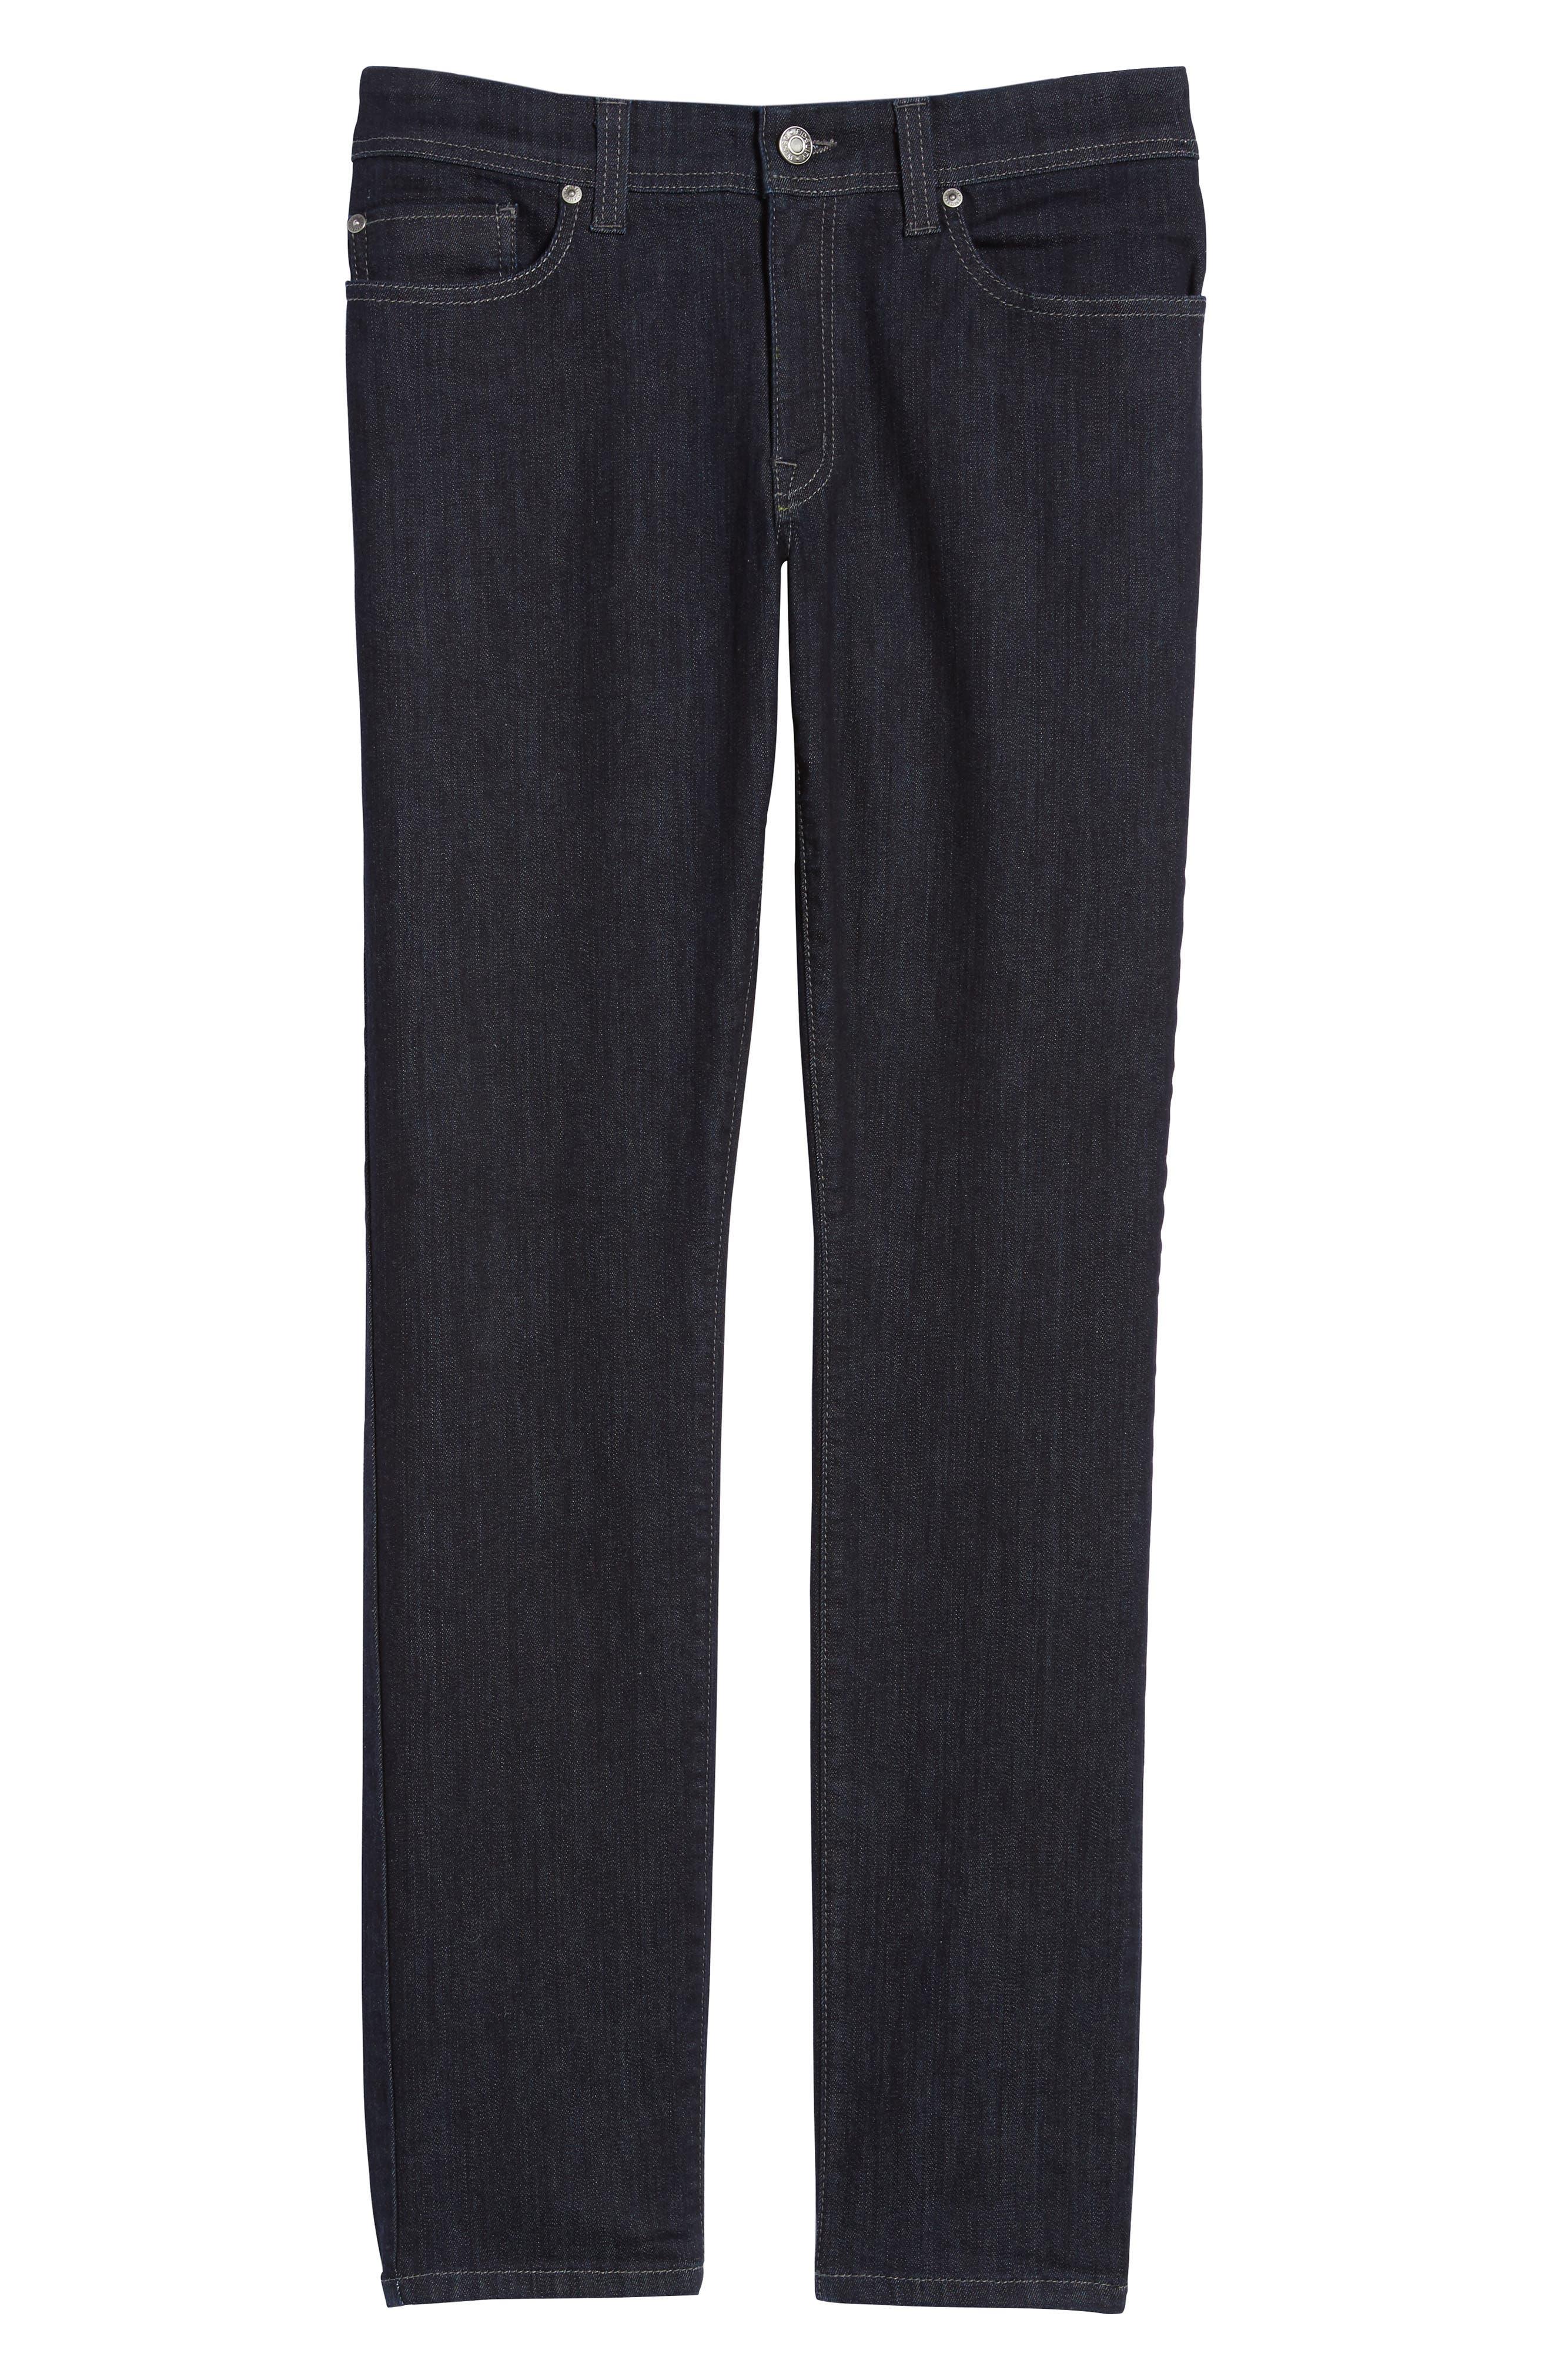 Torino Slim Fit Jeans,                             Alternate thumbnail 7, color,                             Capital Blue